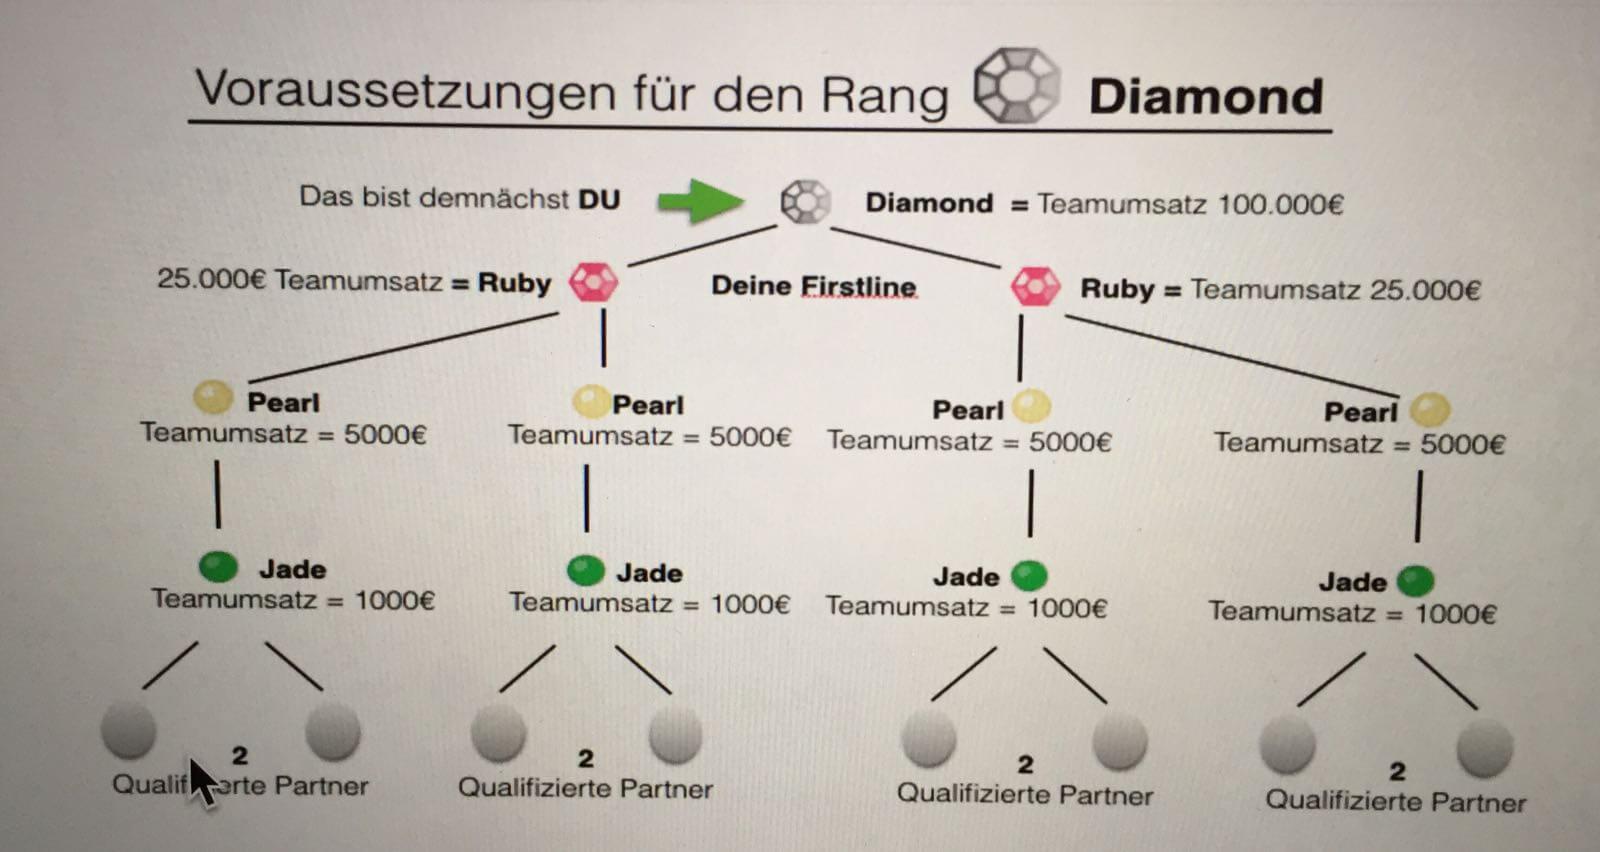 Diamond Schaubild (1)